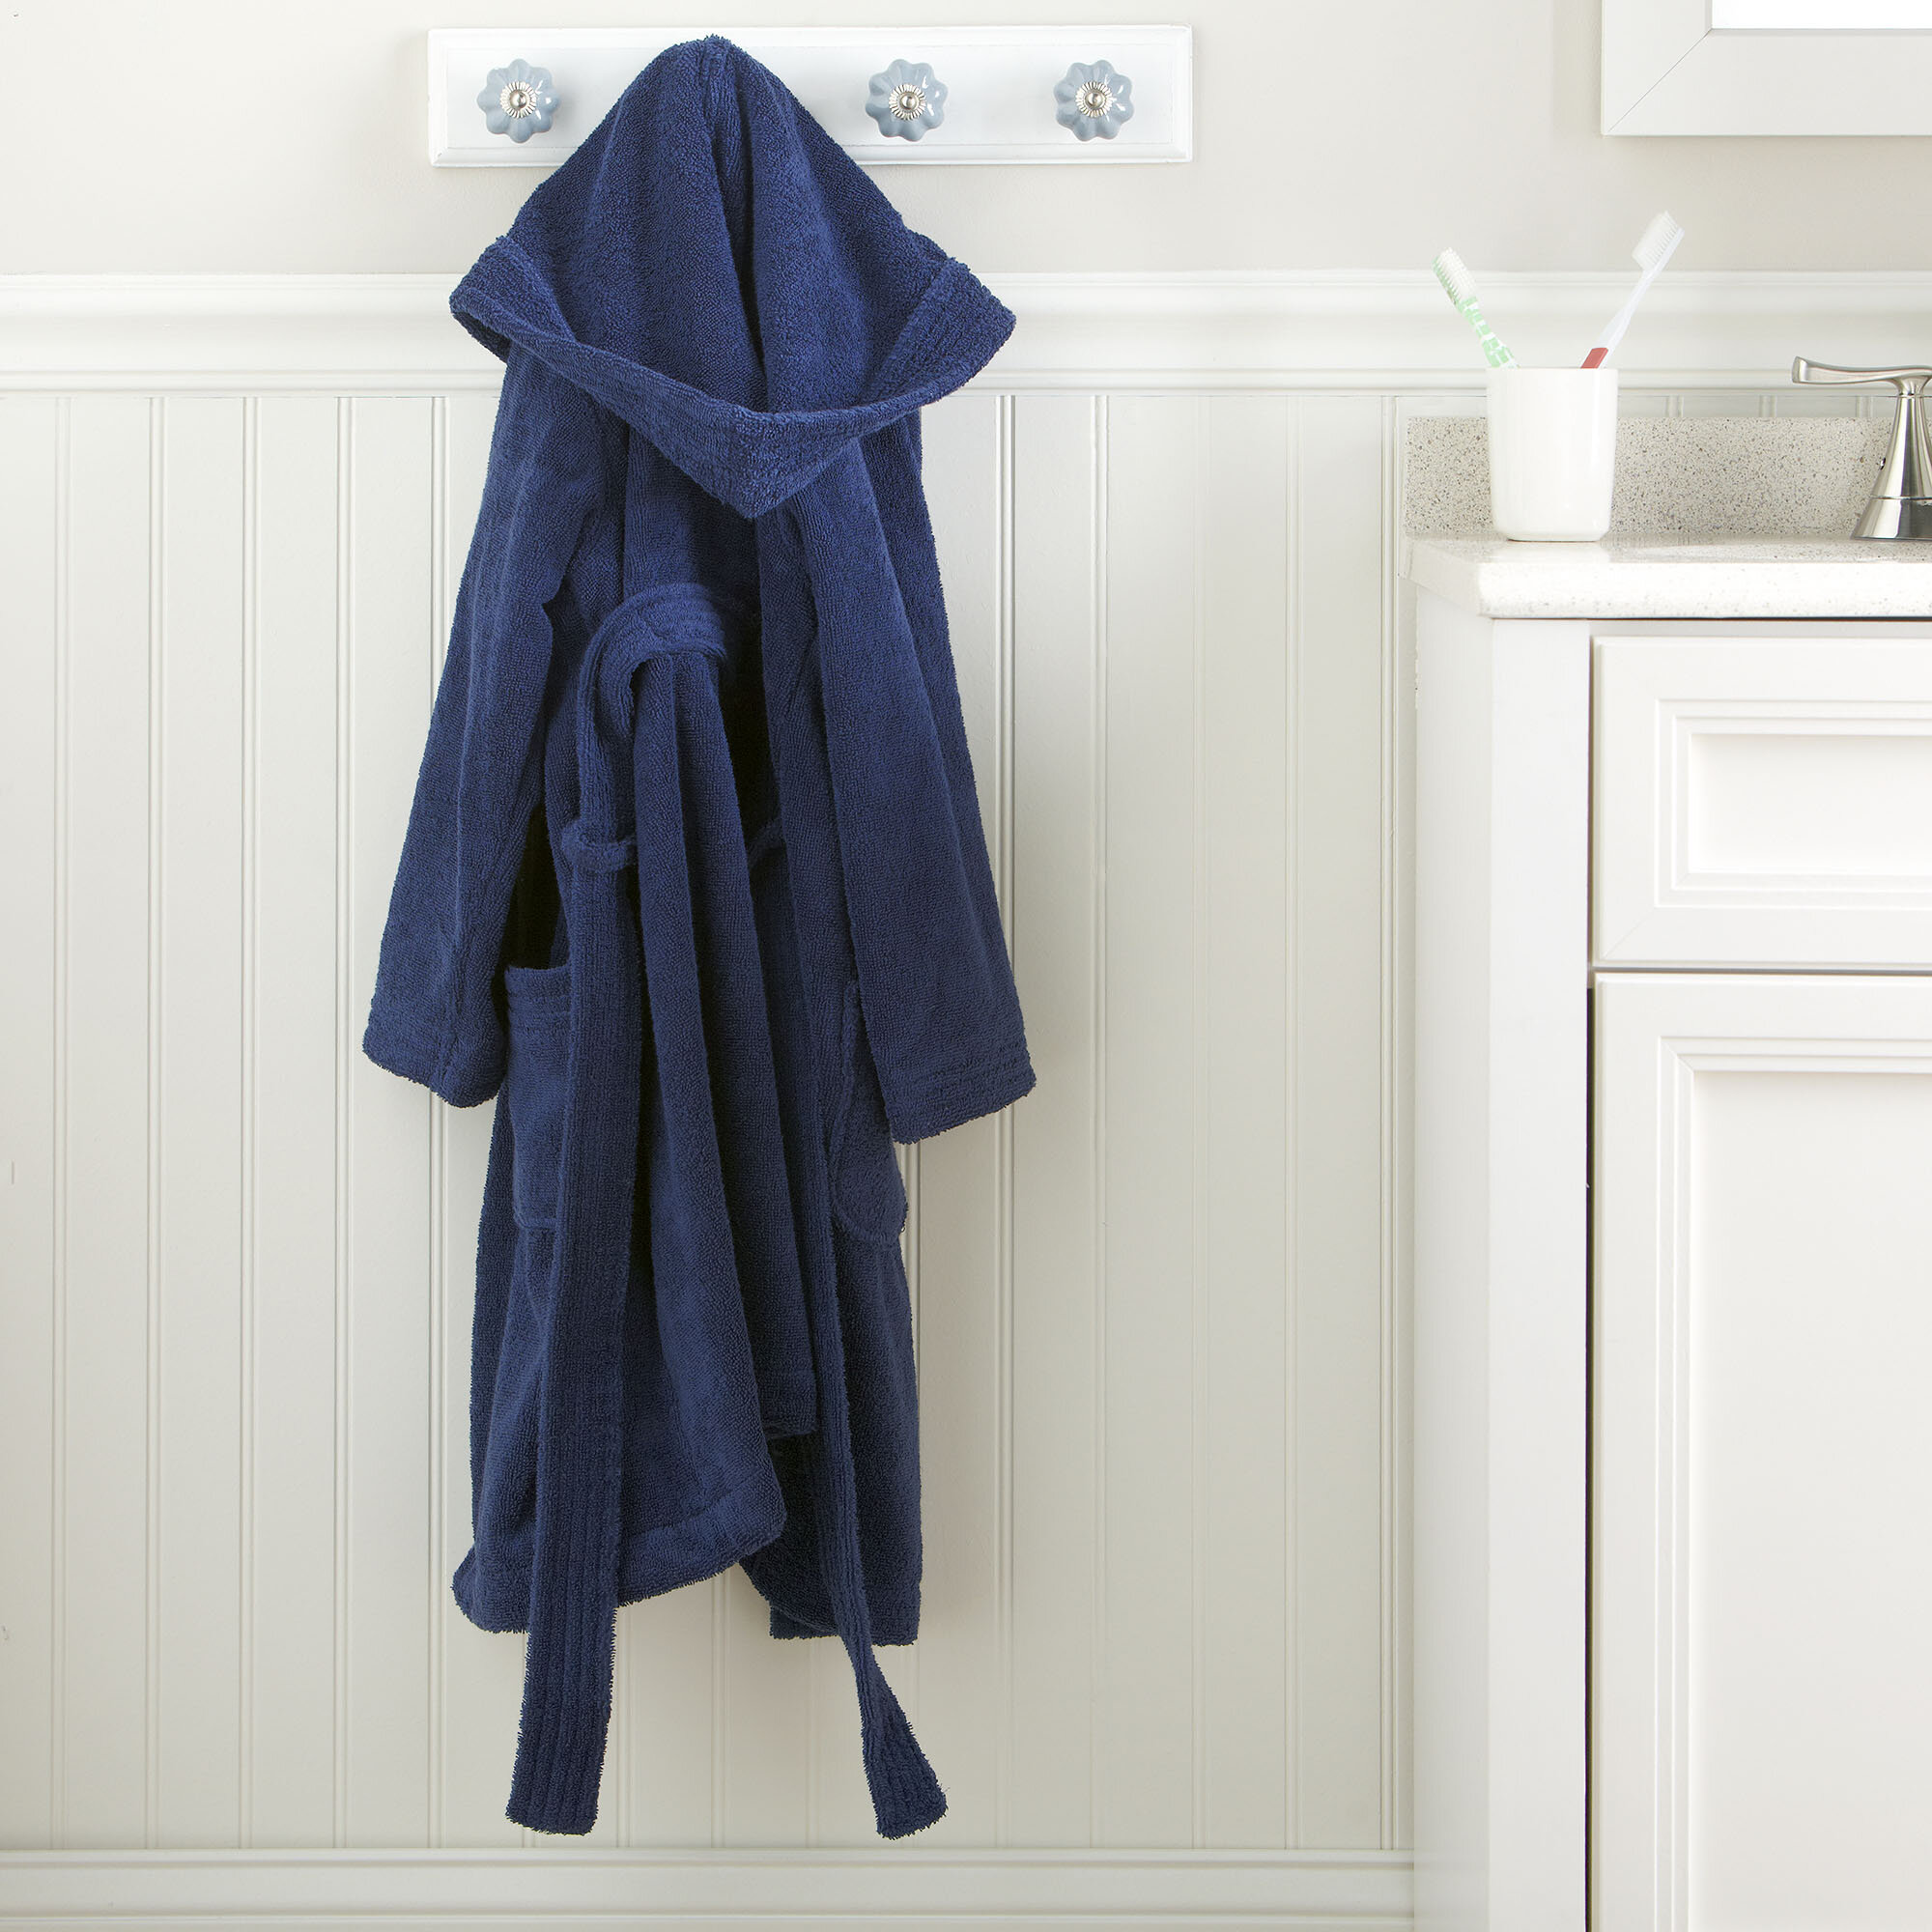 9bc8765983 Harriet Bee Southsea 100% Cotton Terry Cloth Bathrobe   Reviews ...